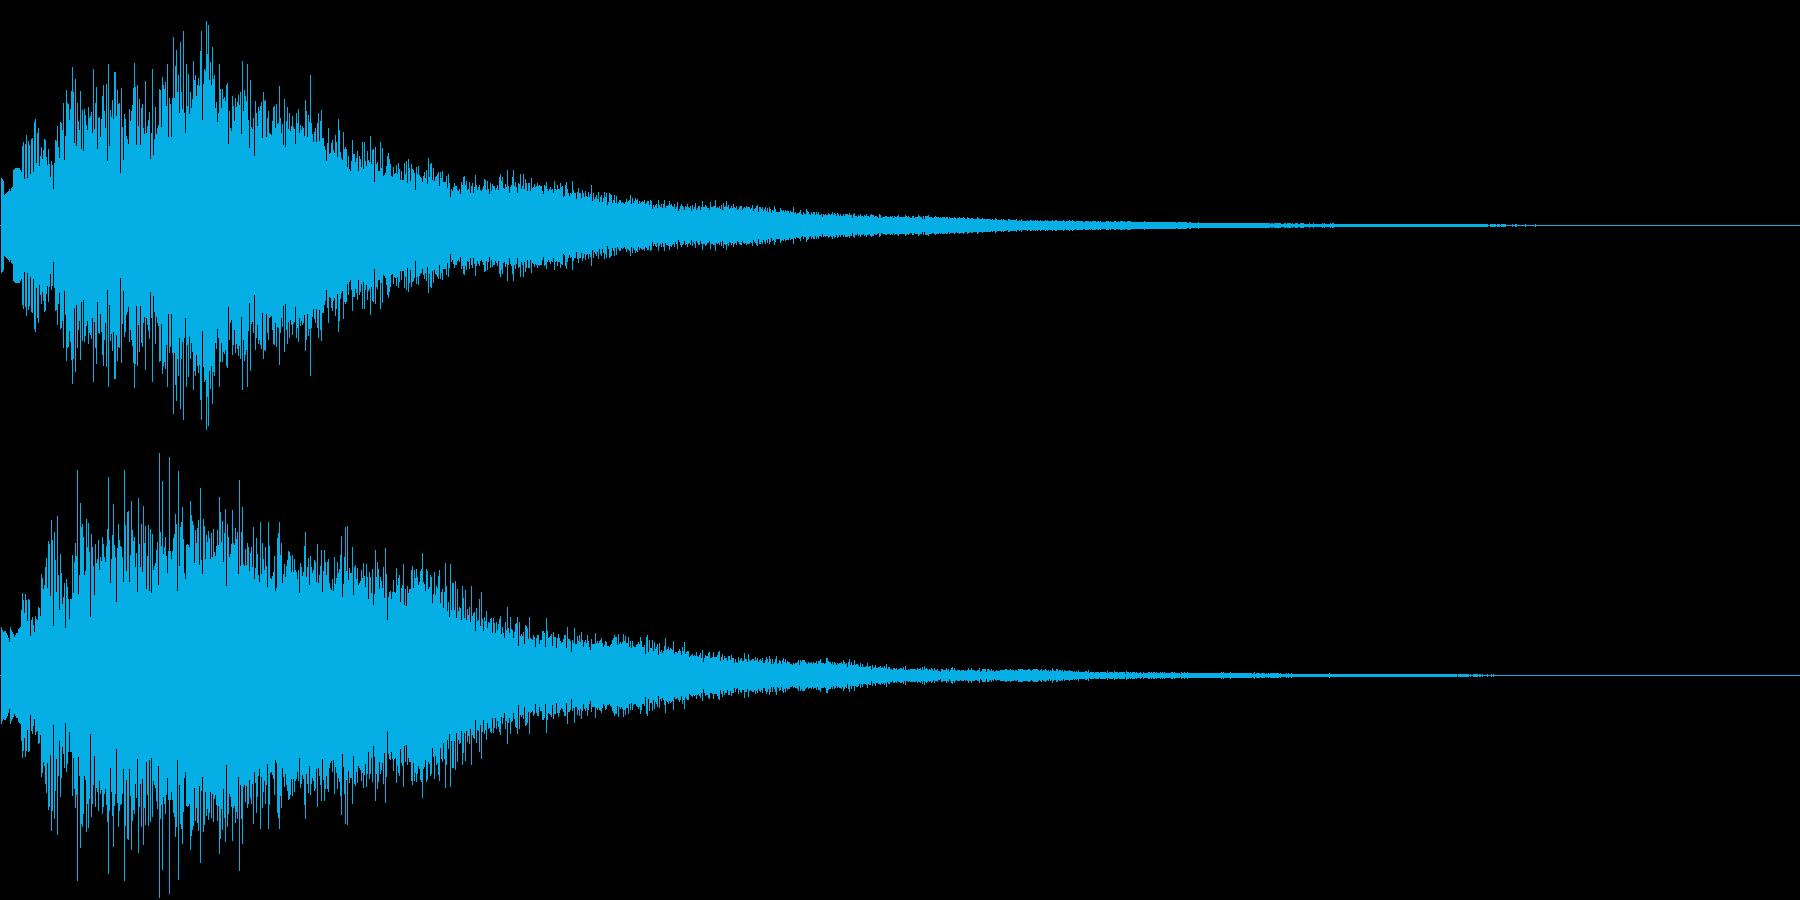 DOREMI ドレミ音階 キラキラFX1の再生済みの波形